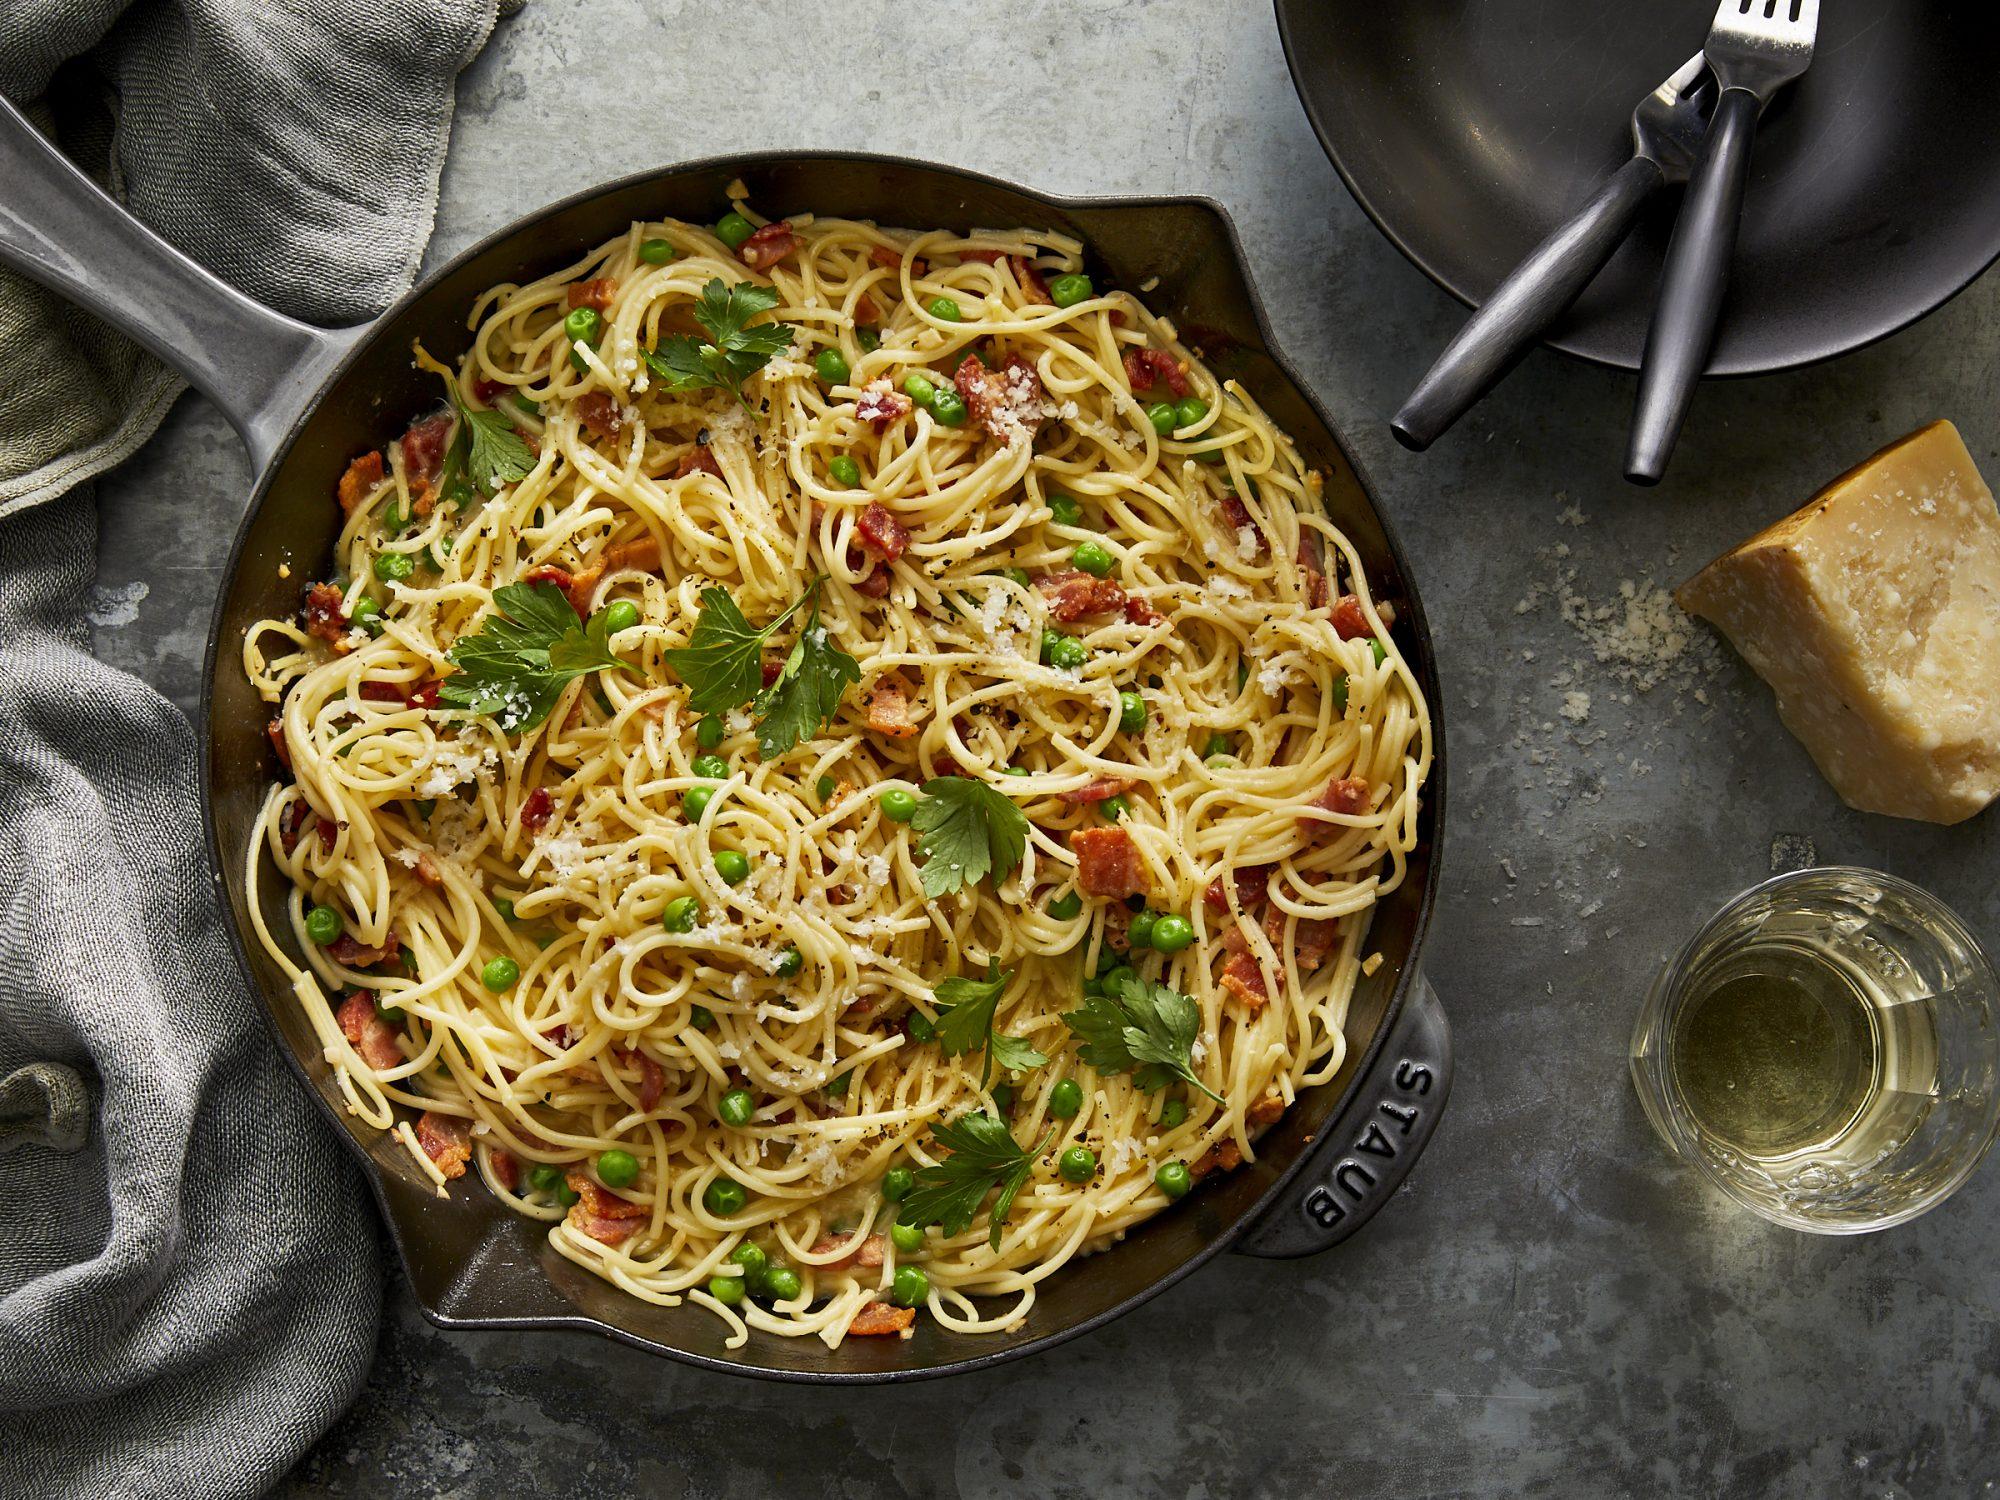 mr - Spaghetti Carbonara Reshoot